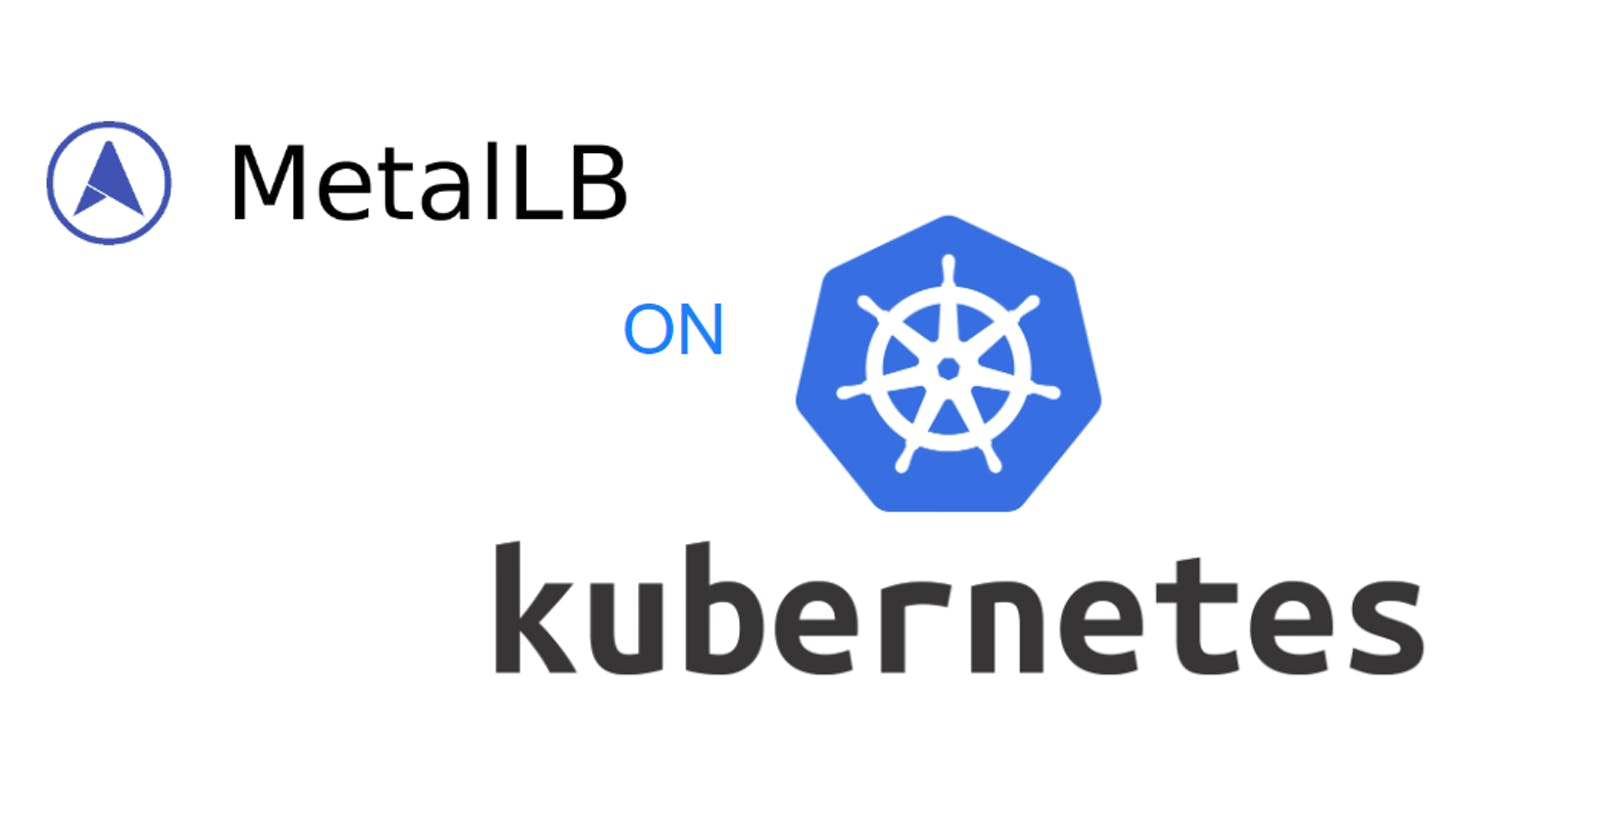 Deploy MetalLB as an on prem load-balancer for your  Kubernetes services